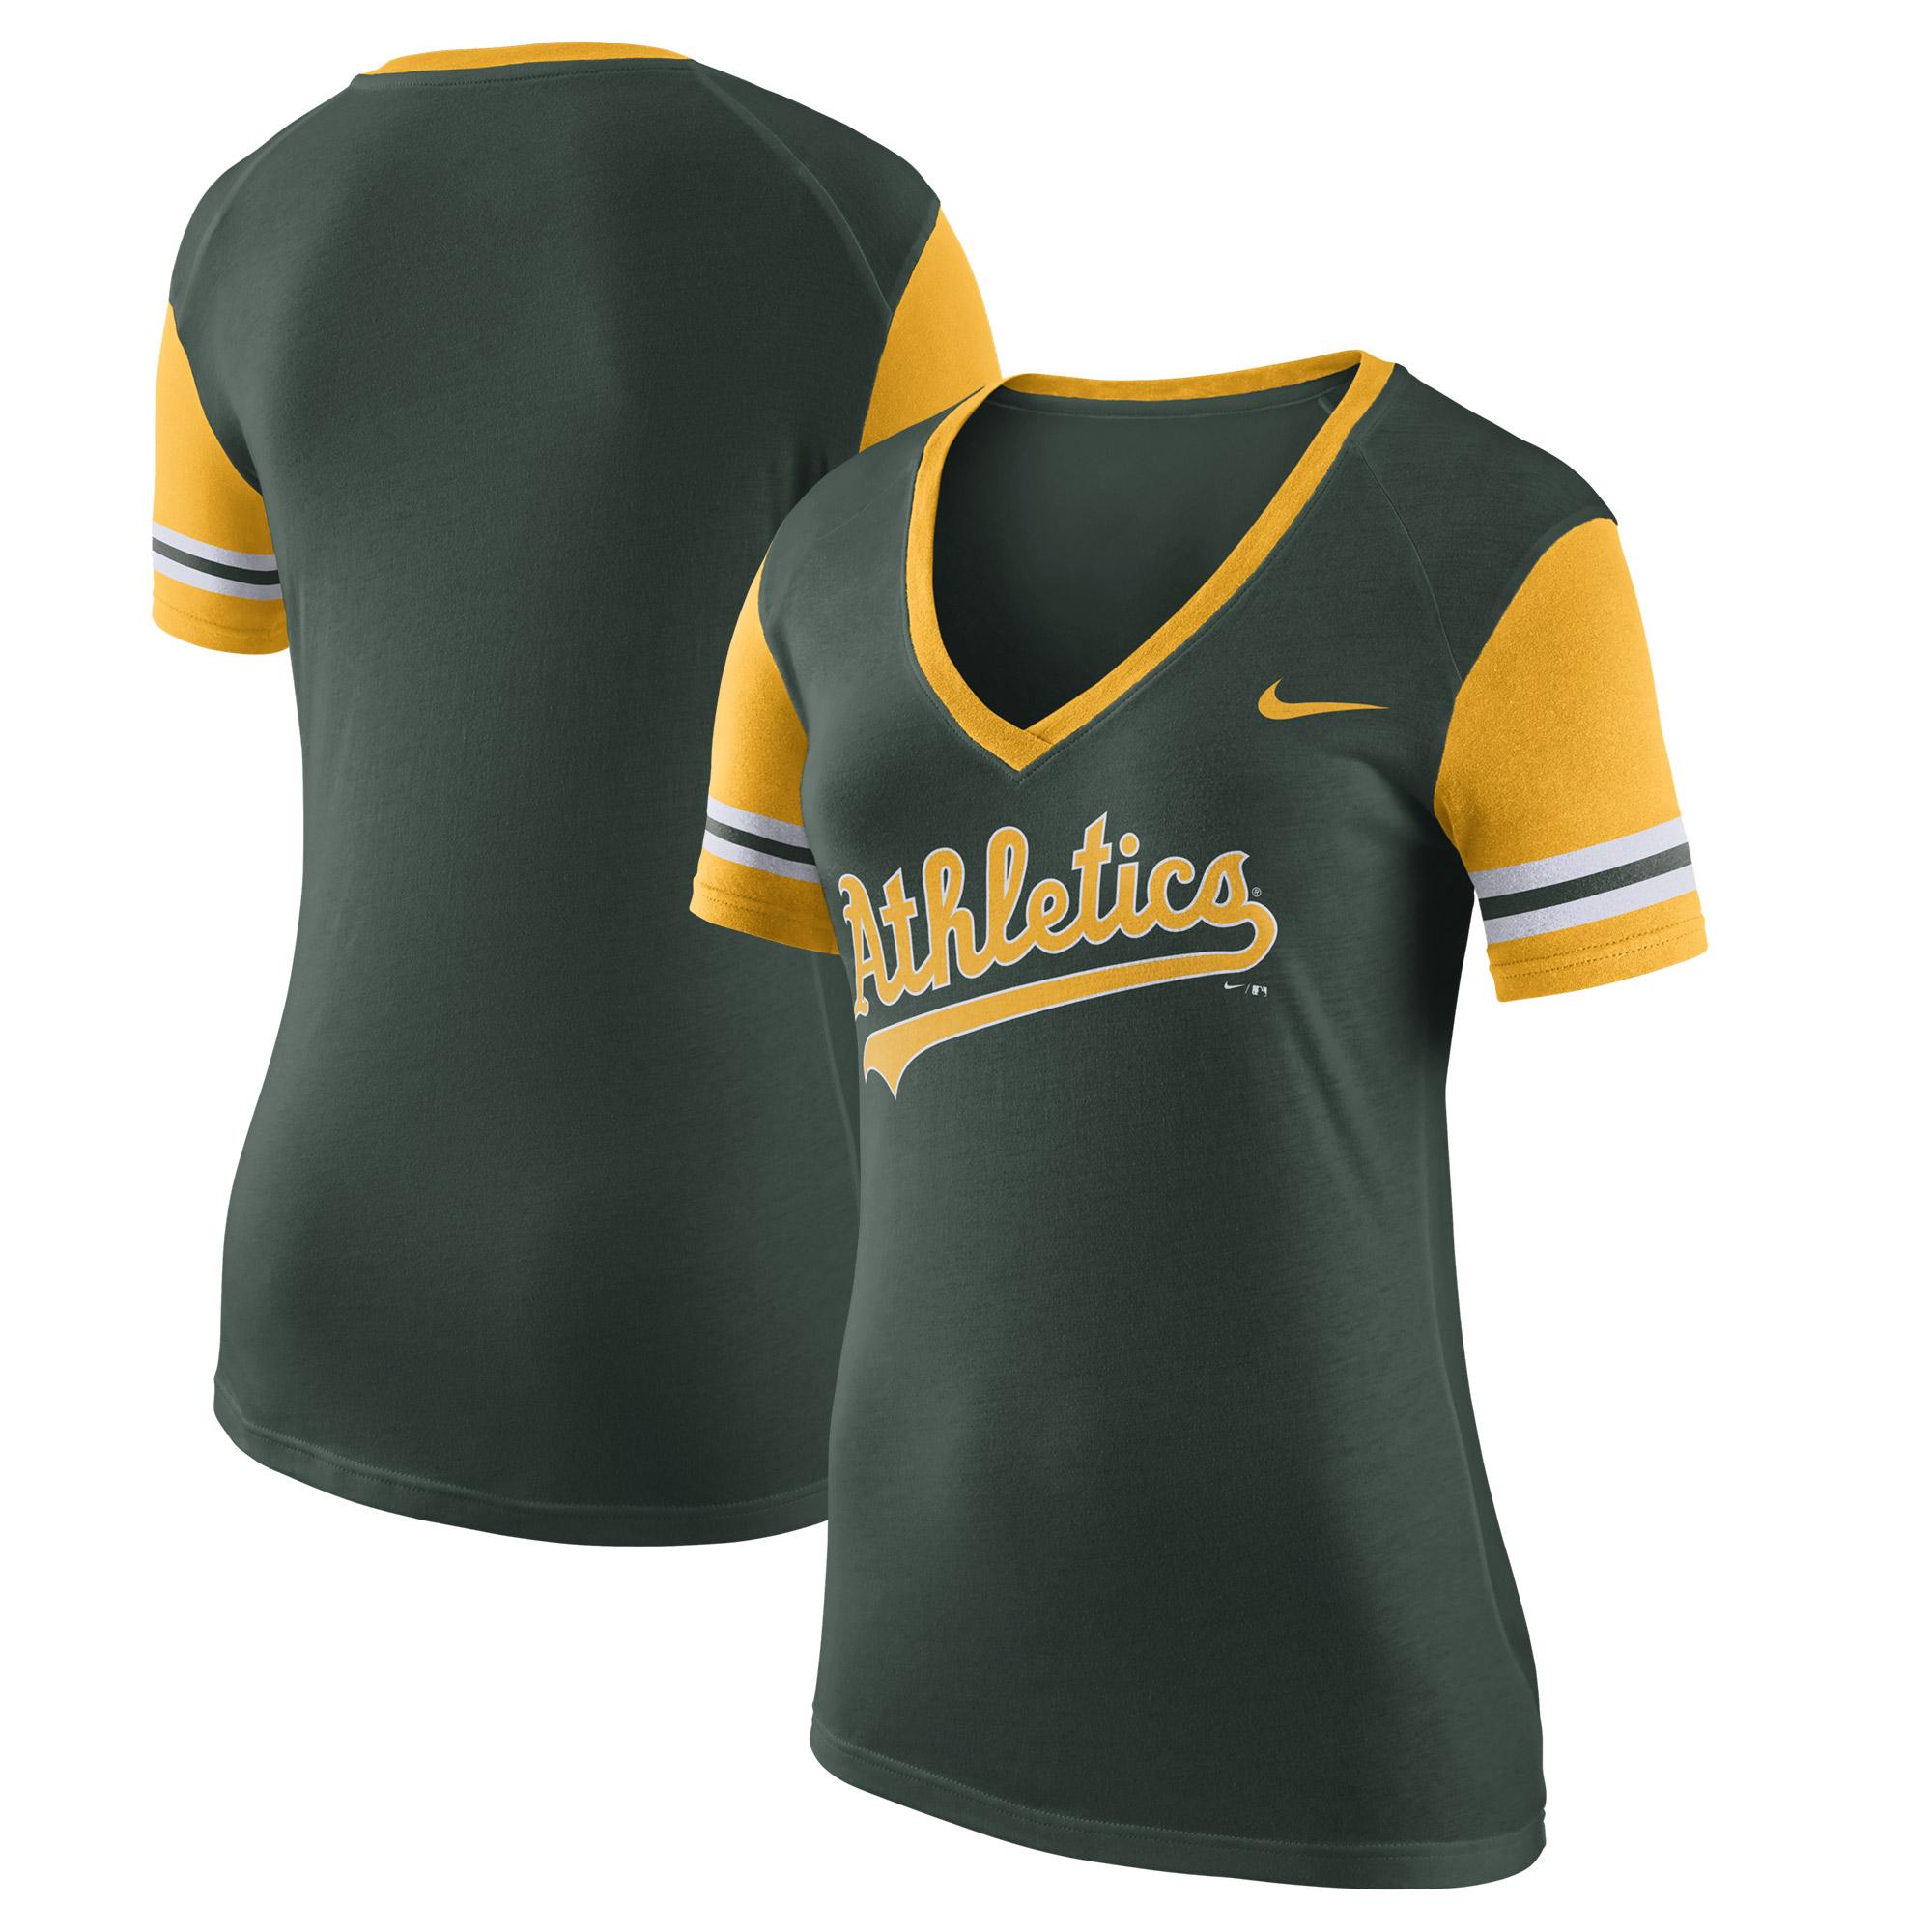 Oakland Athletics Nike Women's Wordmark Colorblock V-Neck T-Shirt - Green